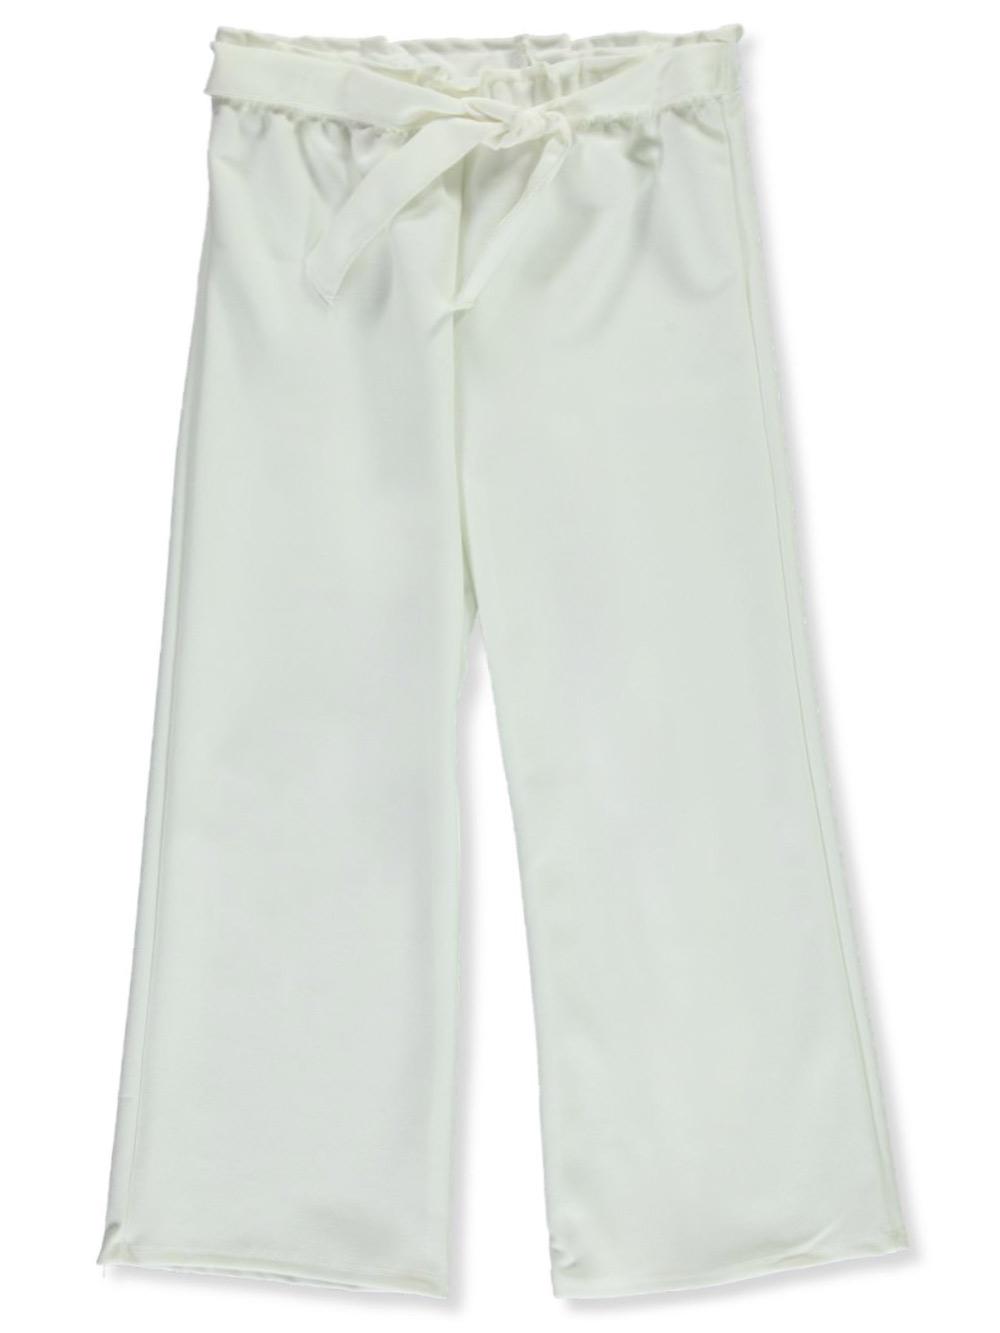 Miss Majesty Girls Front Tie Palazzo Dress Pants